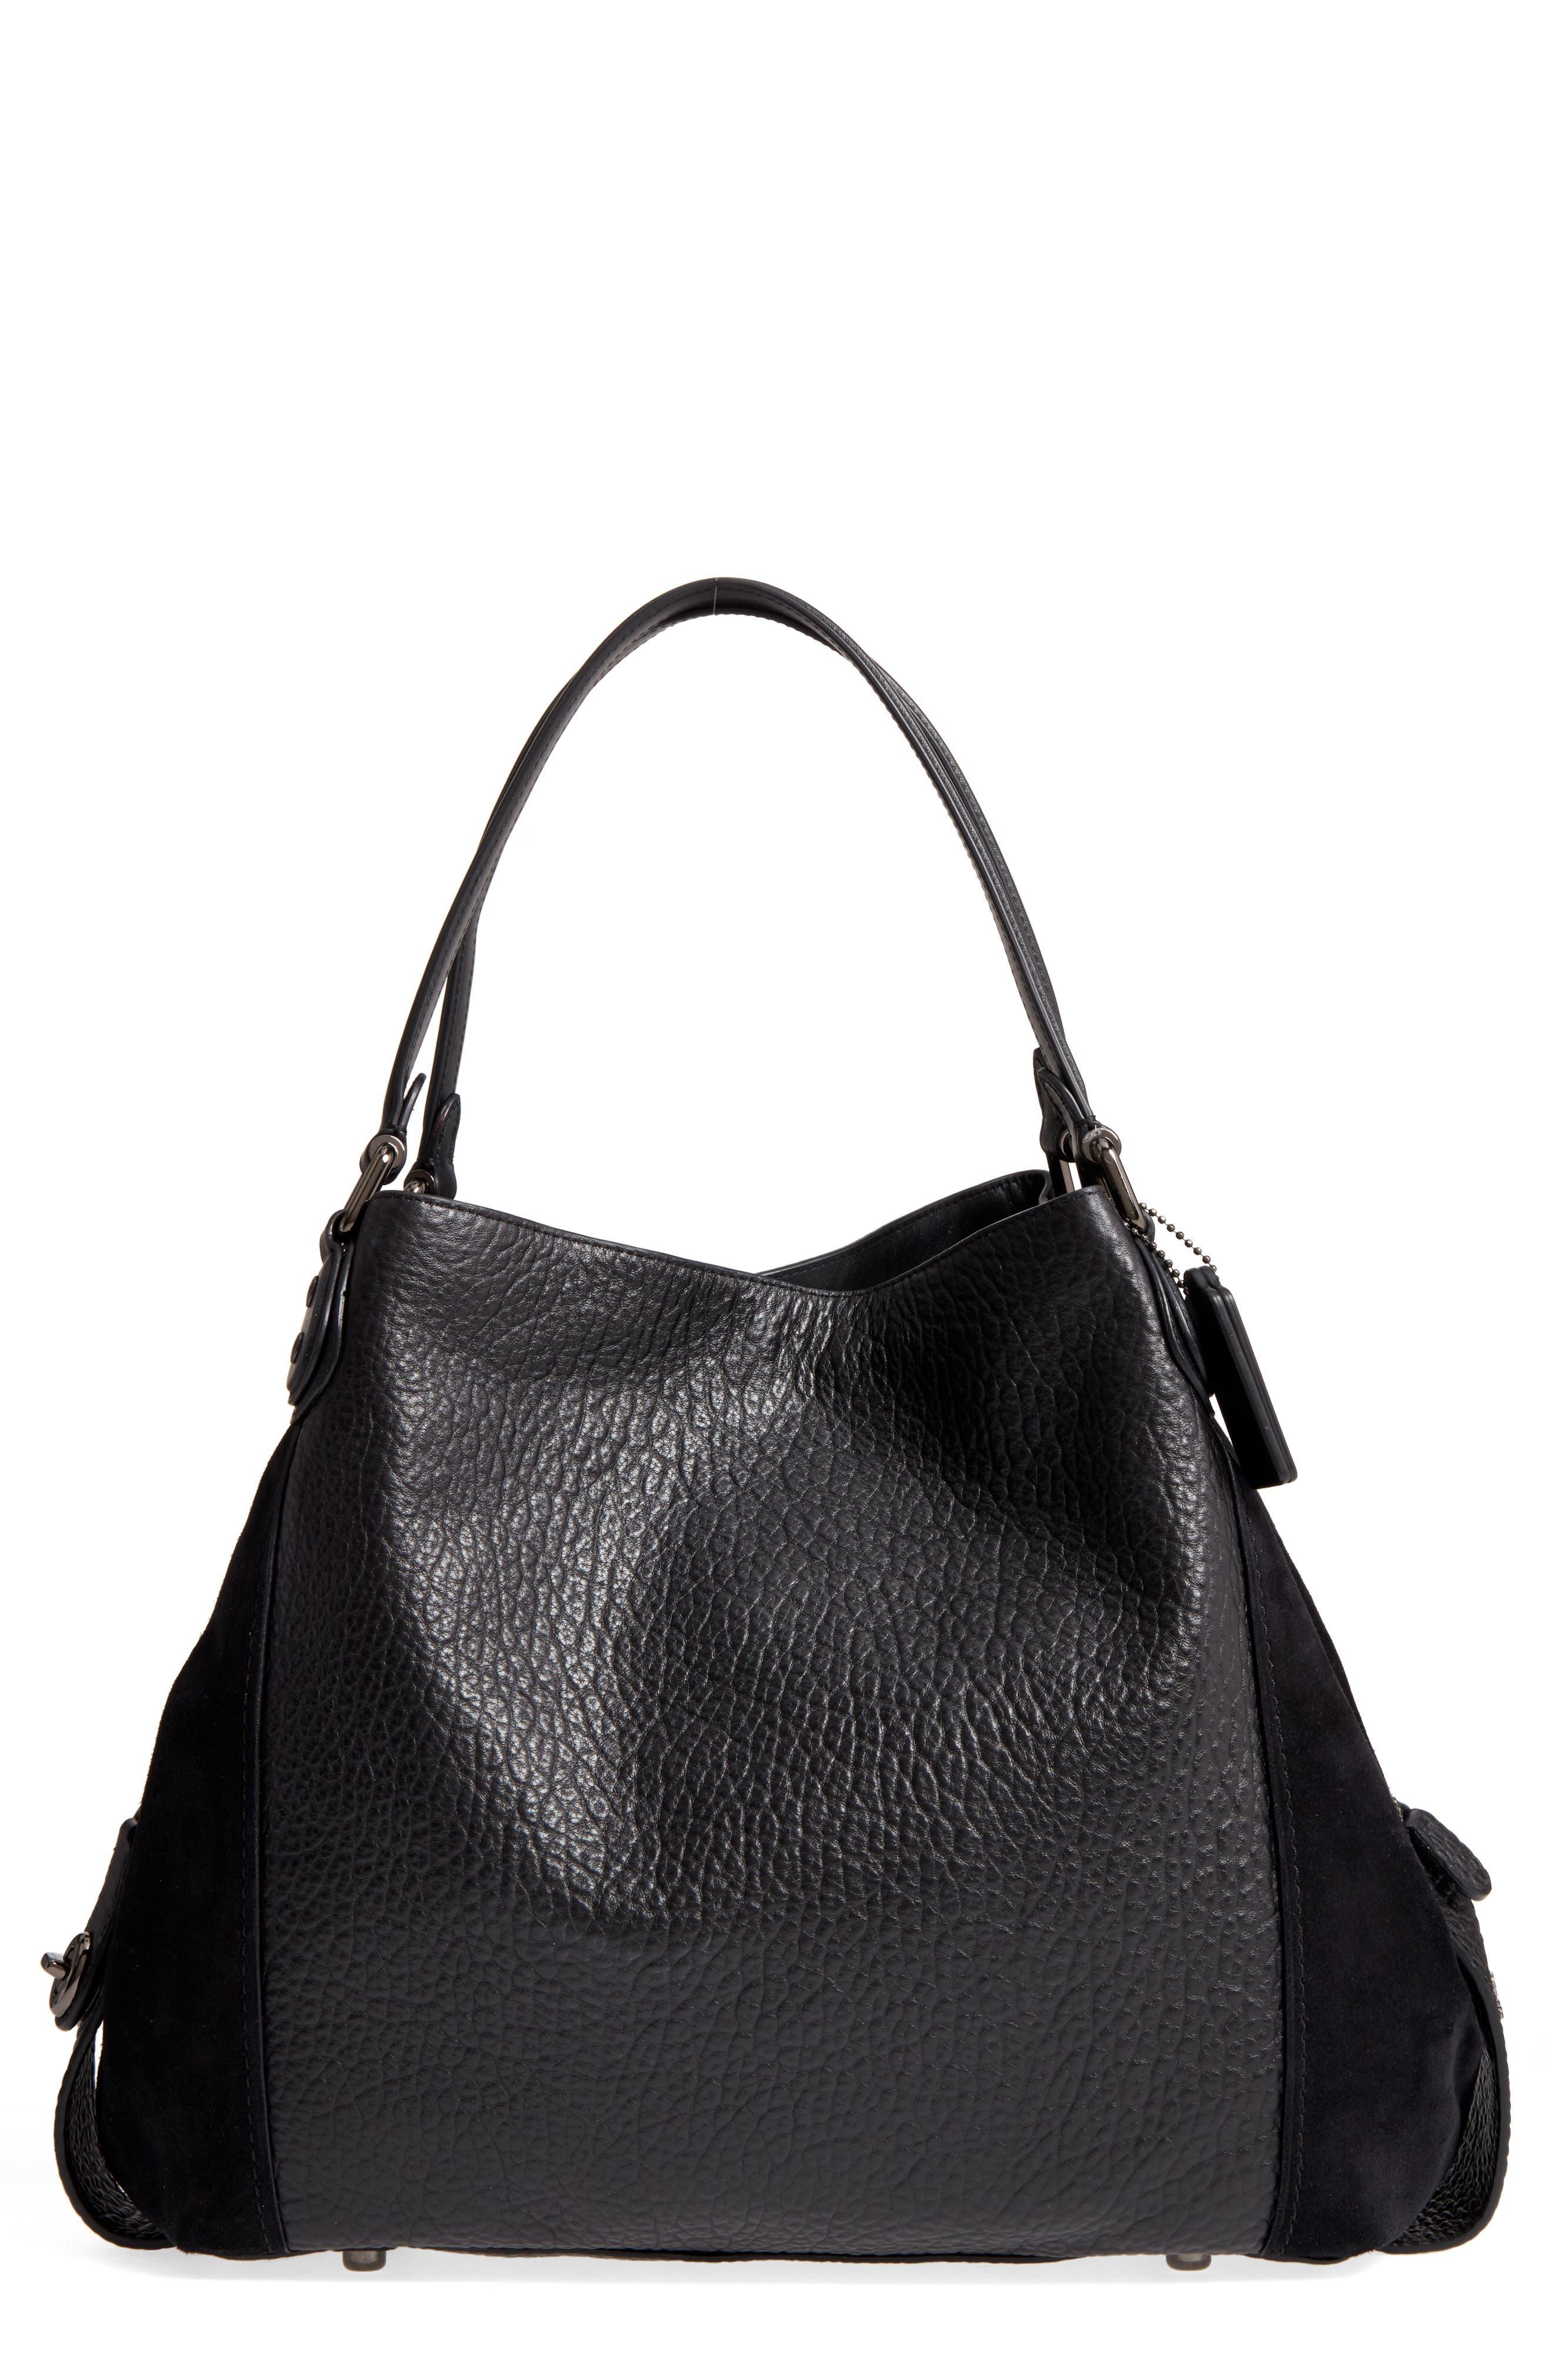 Edie 42 Leather & Suede Shoulder Bag,                         Main,                         color, Black